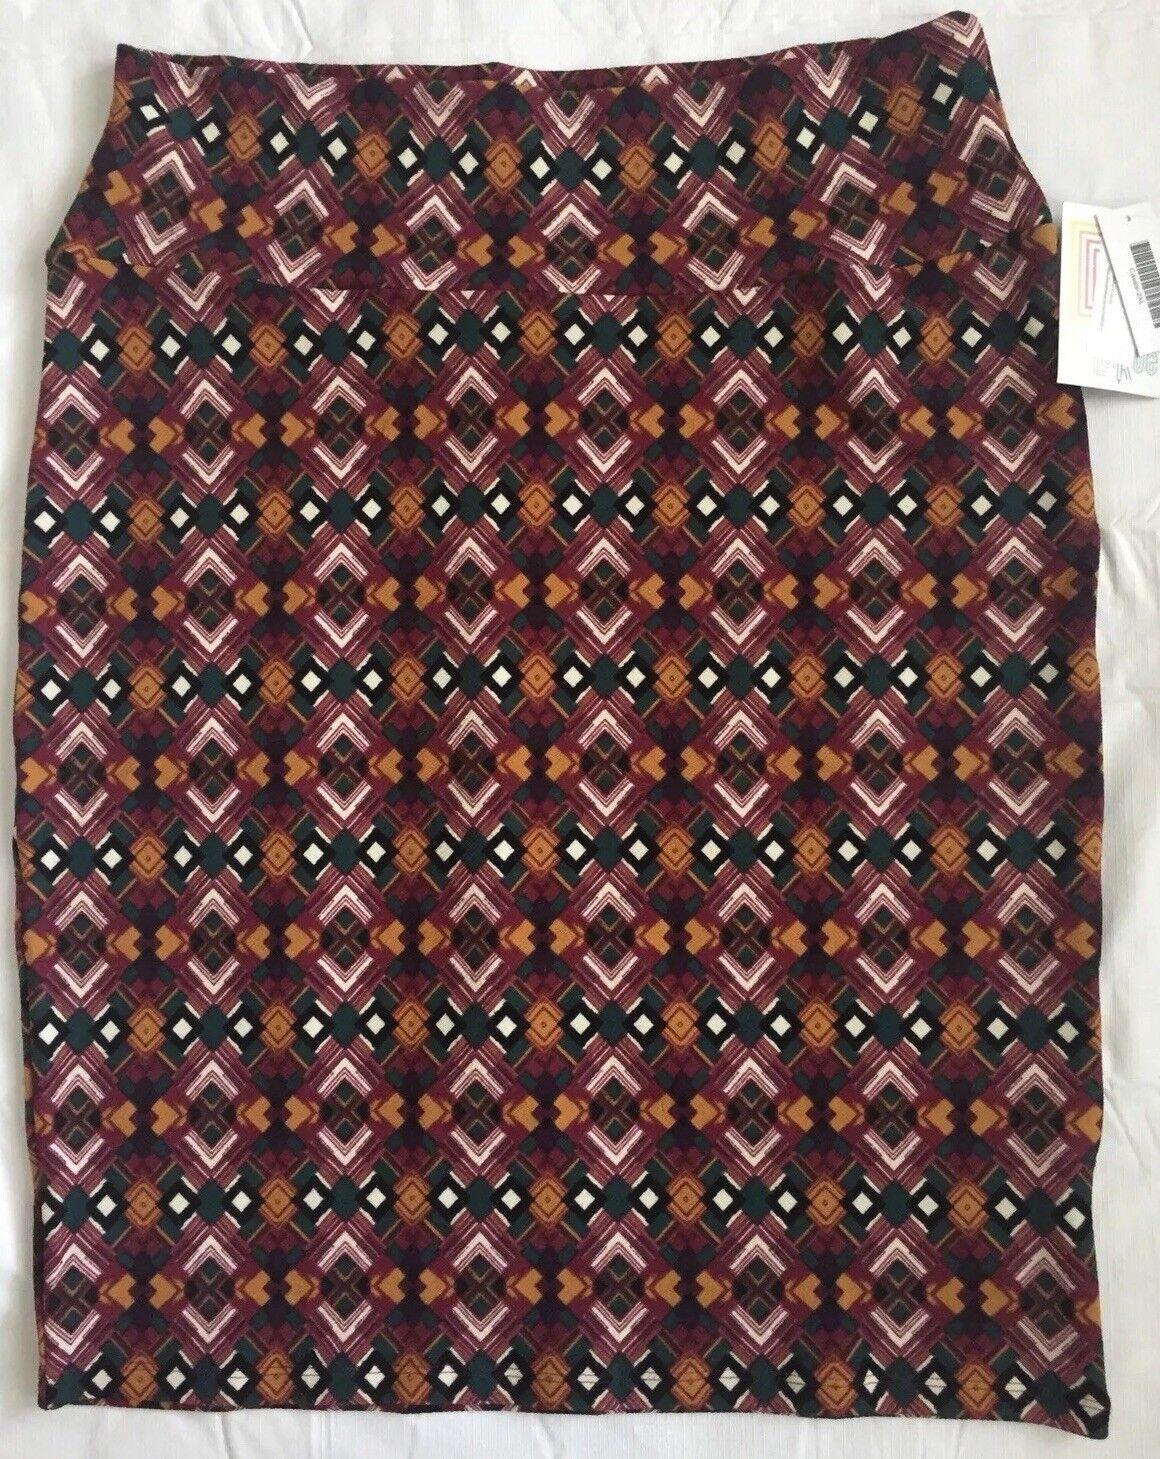 412f3a7bd1d30 LulaRoe Cassie Knee Length Pencil Skirt Size Multicolor Straight Stretch  NWT 2XL ovnbzc5670-Skirts